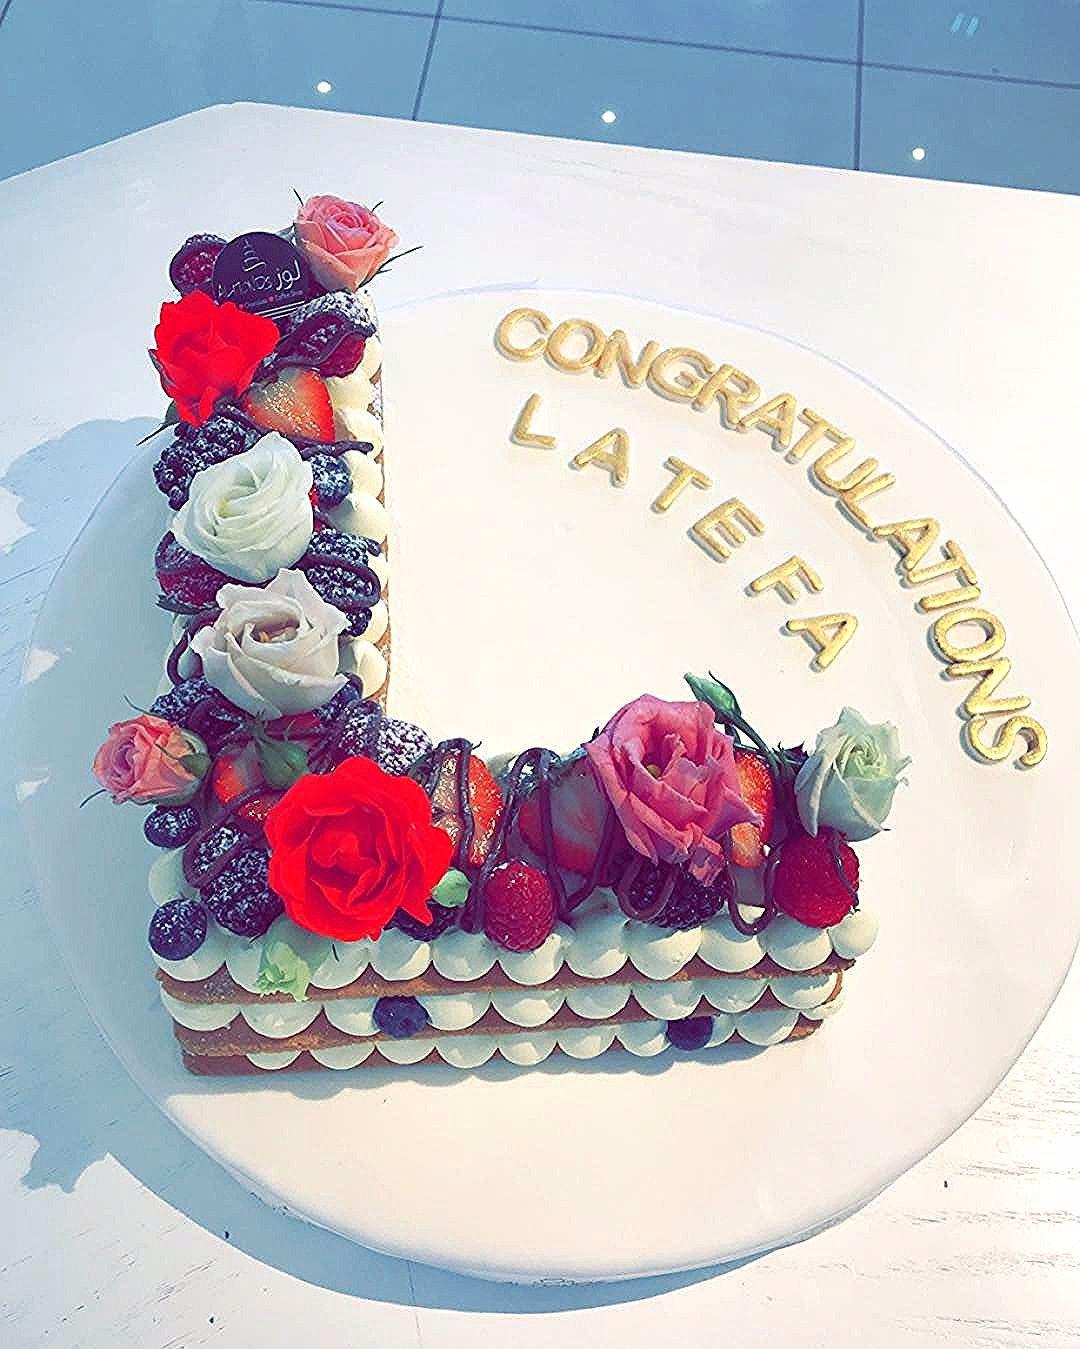 Cake Cup Cake Chocolate Chocolate Cake Sweet Sweety Birthdays Party Coffee Coffee Shop Elega In 2020 Birthday Cakes For Women Cakes For Women Birthday Gifts For Women